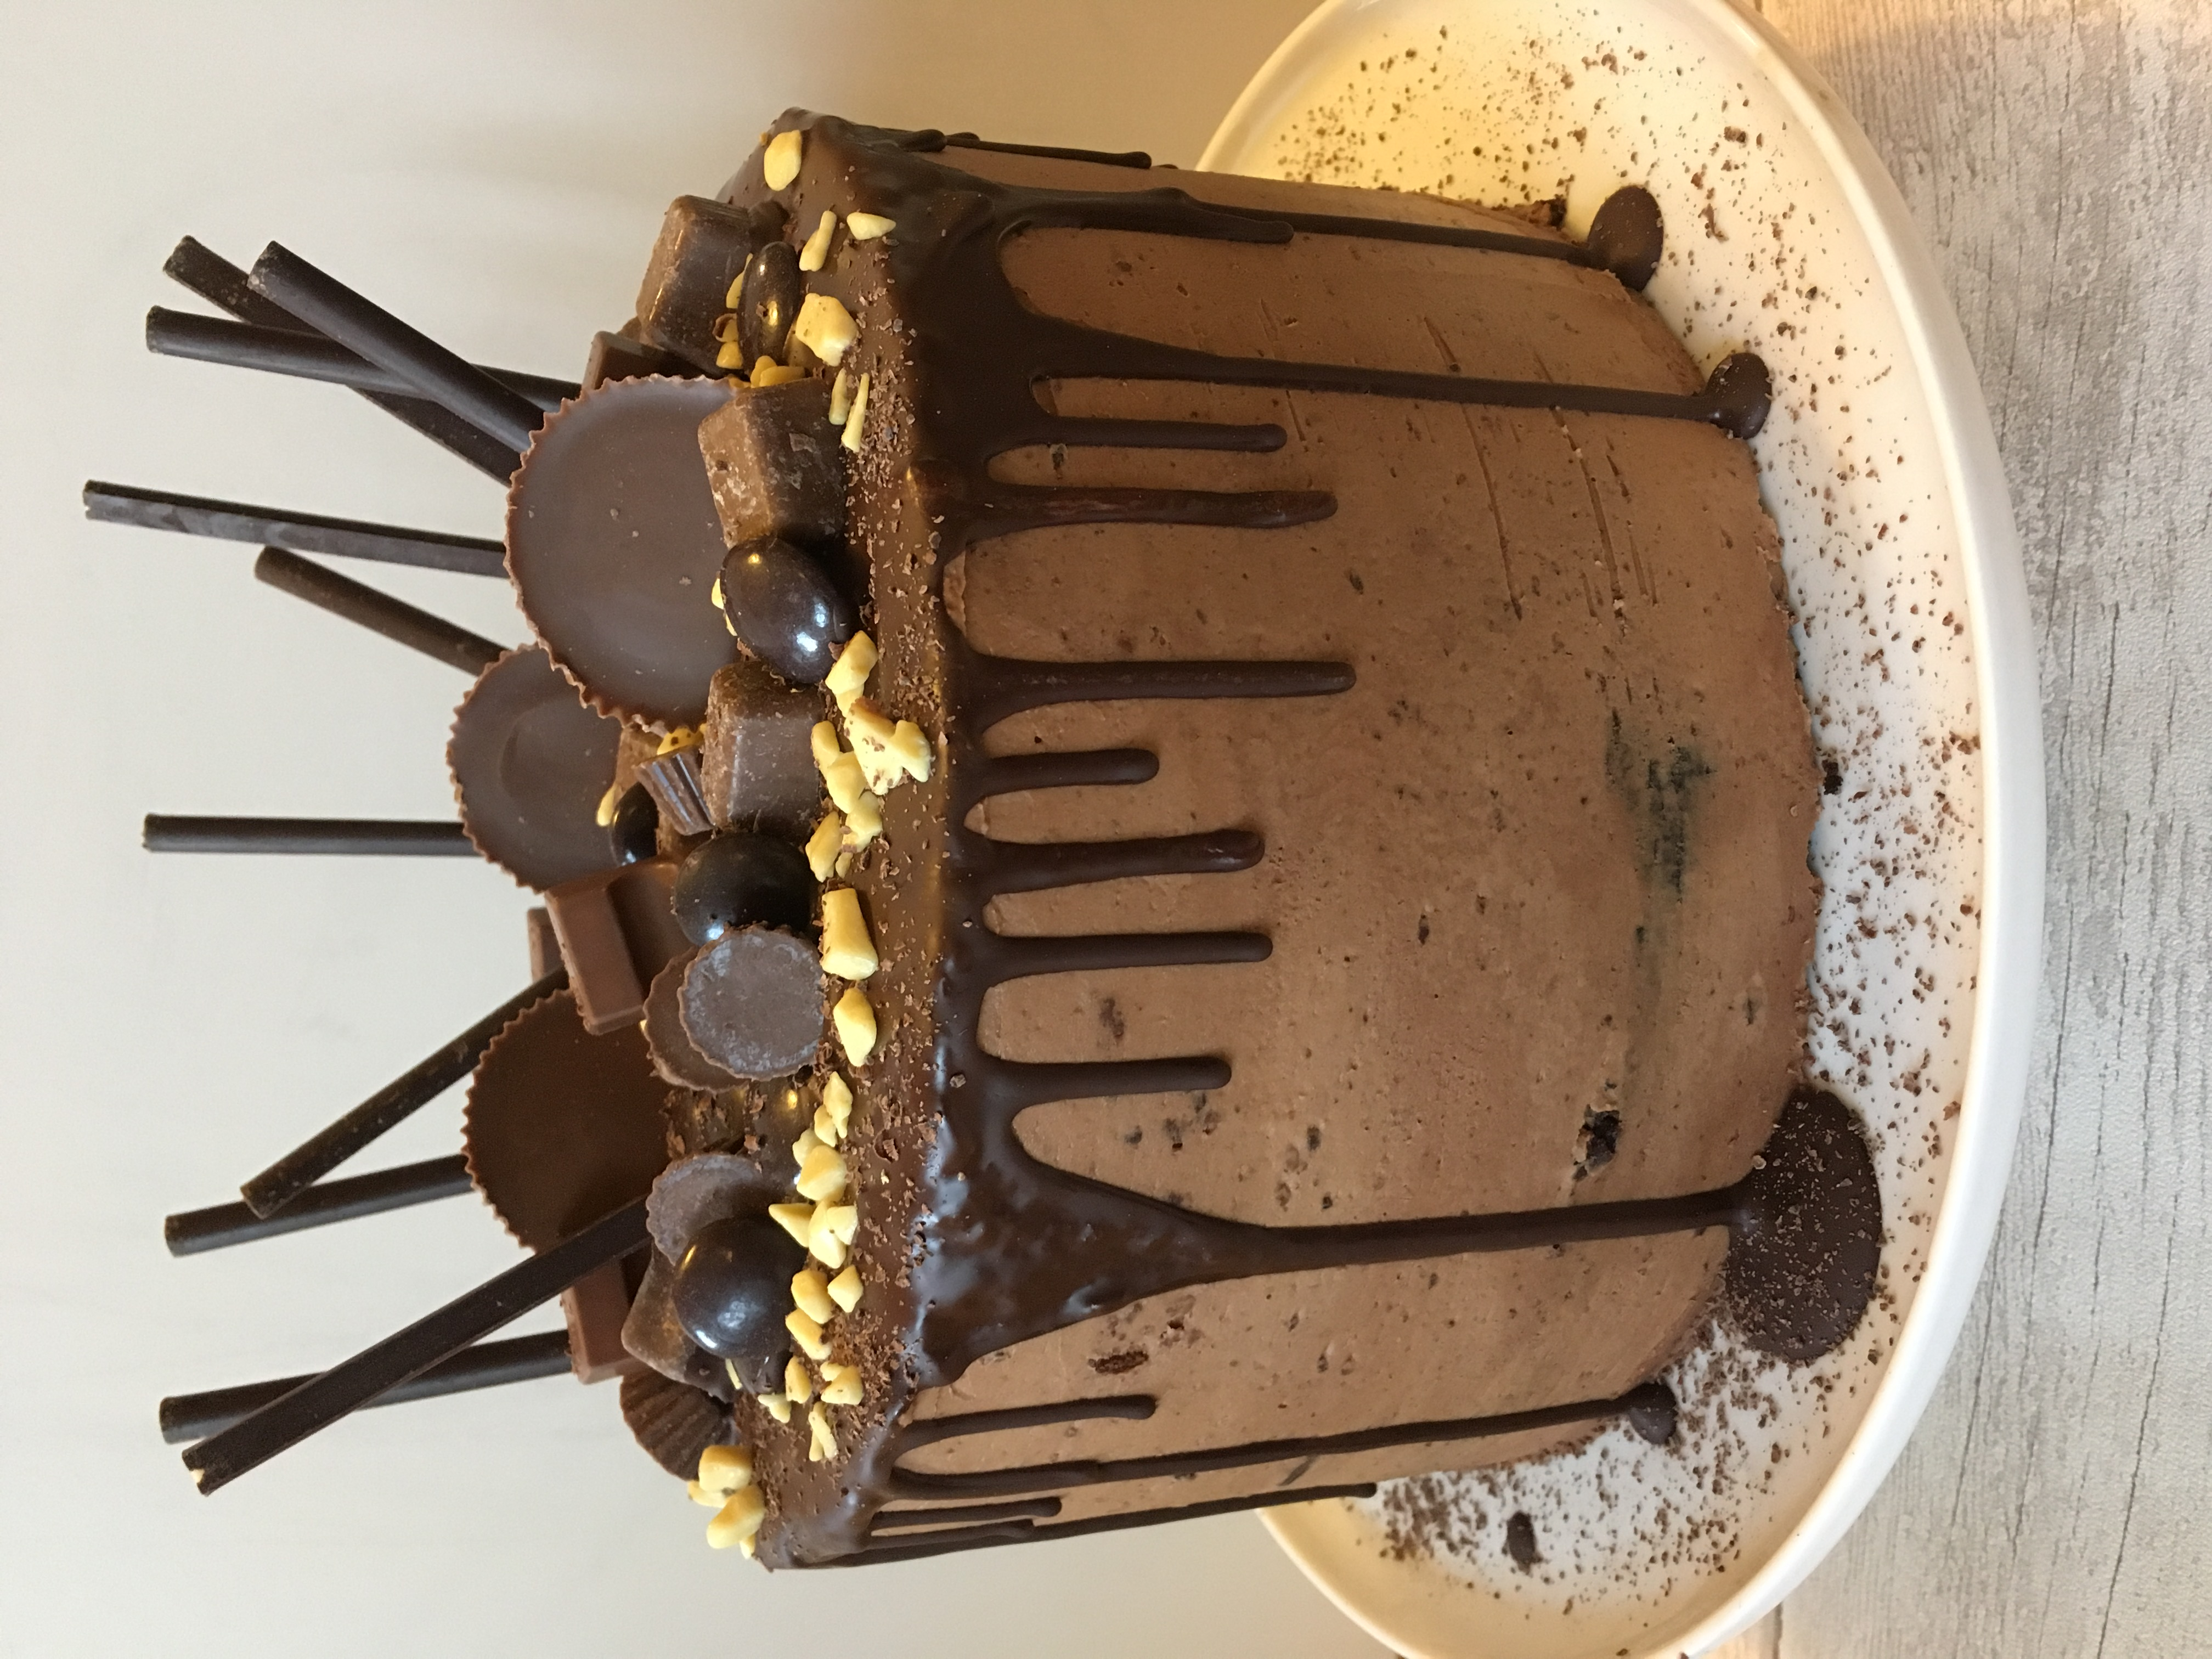 Choc-a-licious Cake